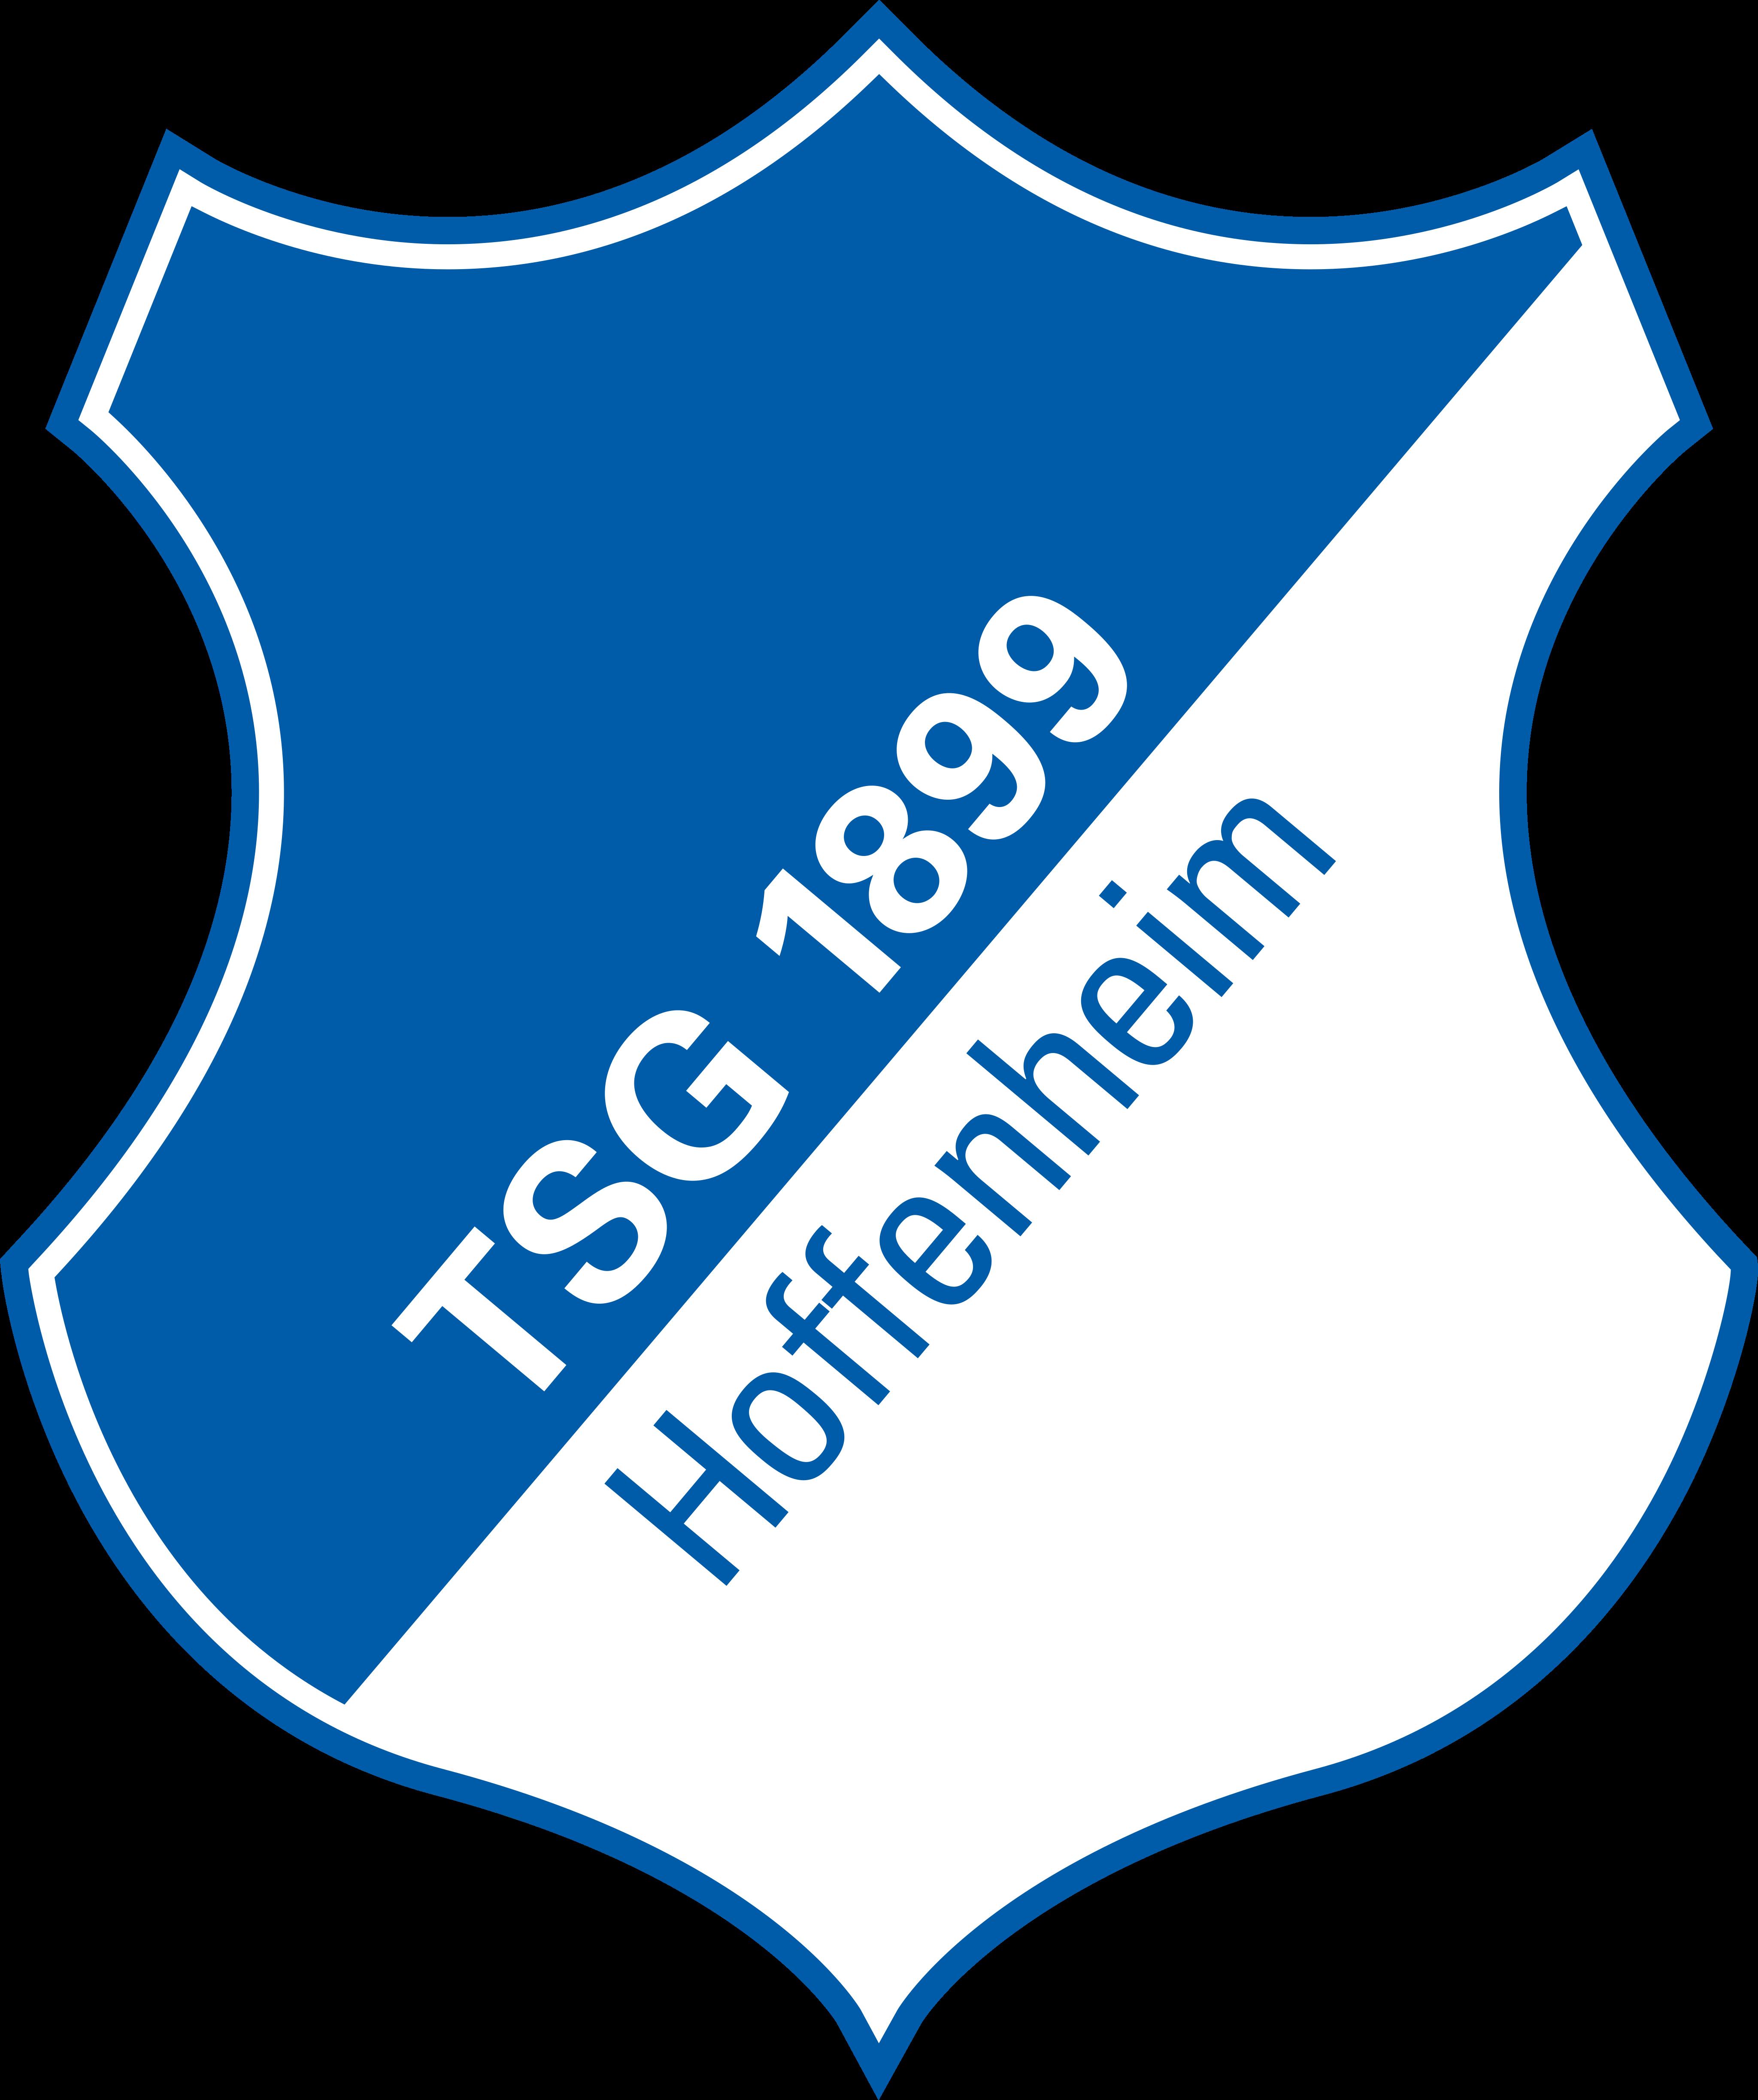 hoffenheim logo - Hoffenheim Logo